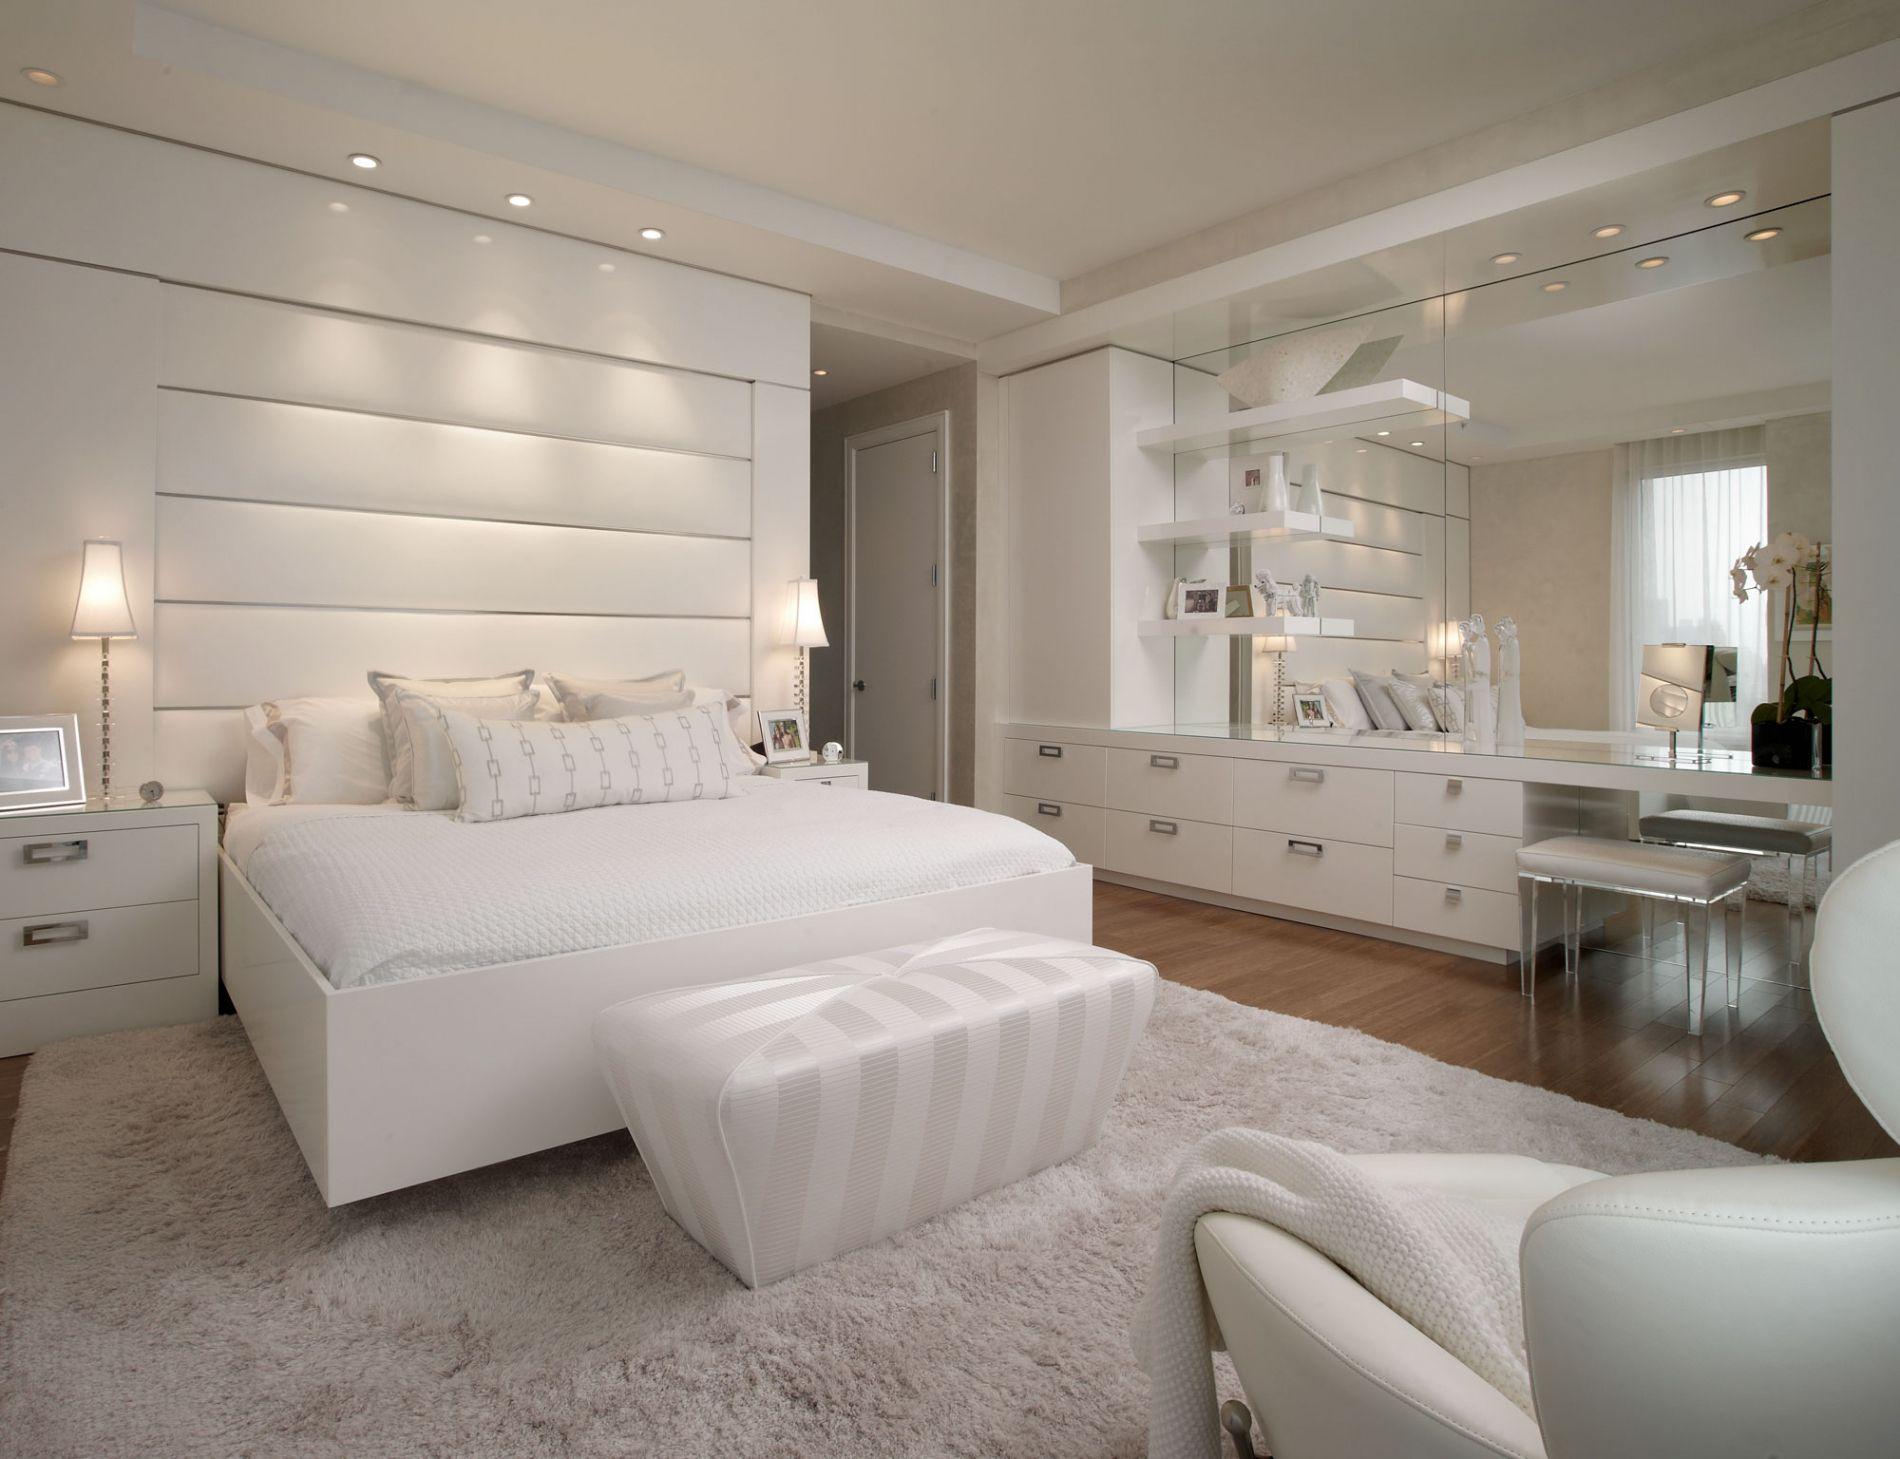 Cozy Glamour Bedroom Design Ideas 33 House Decoration Ideas